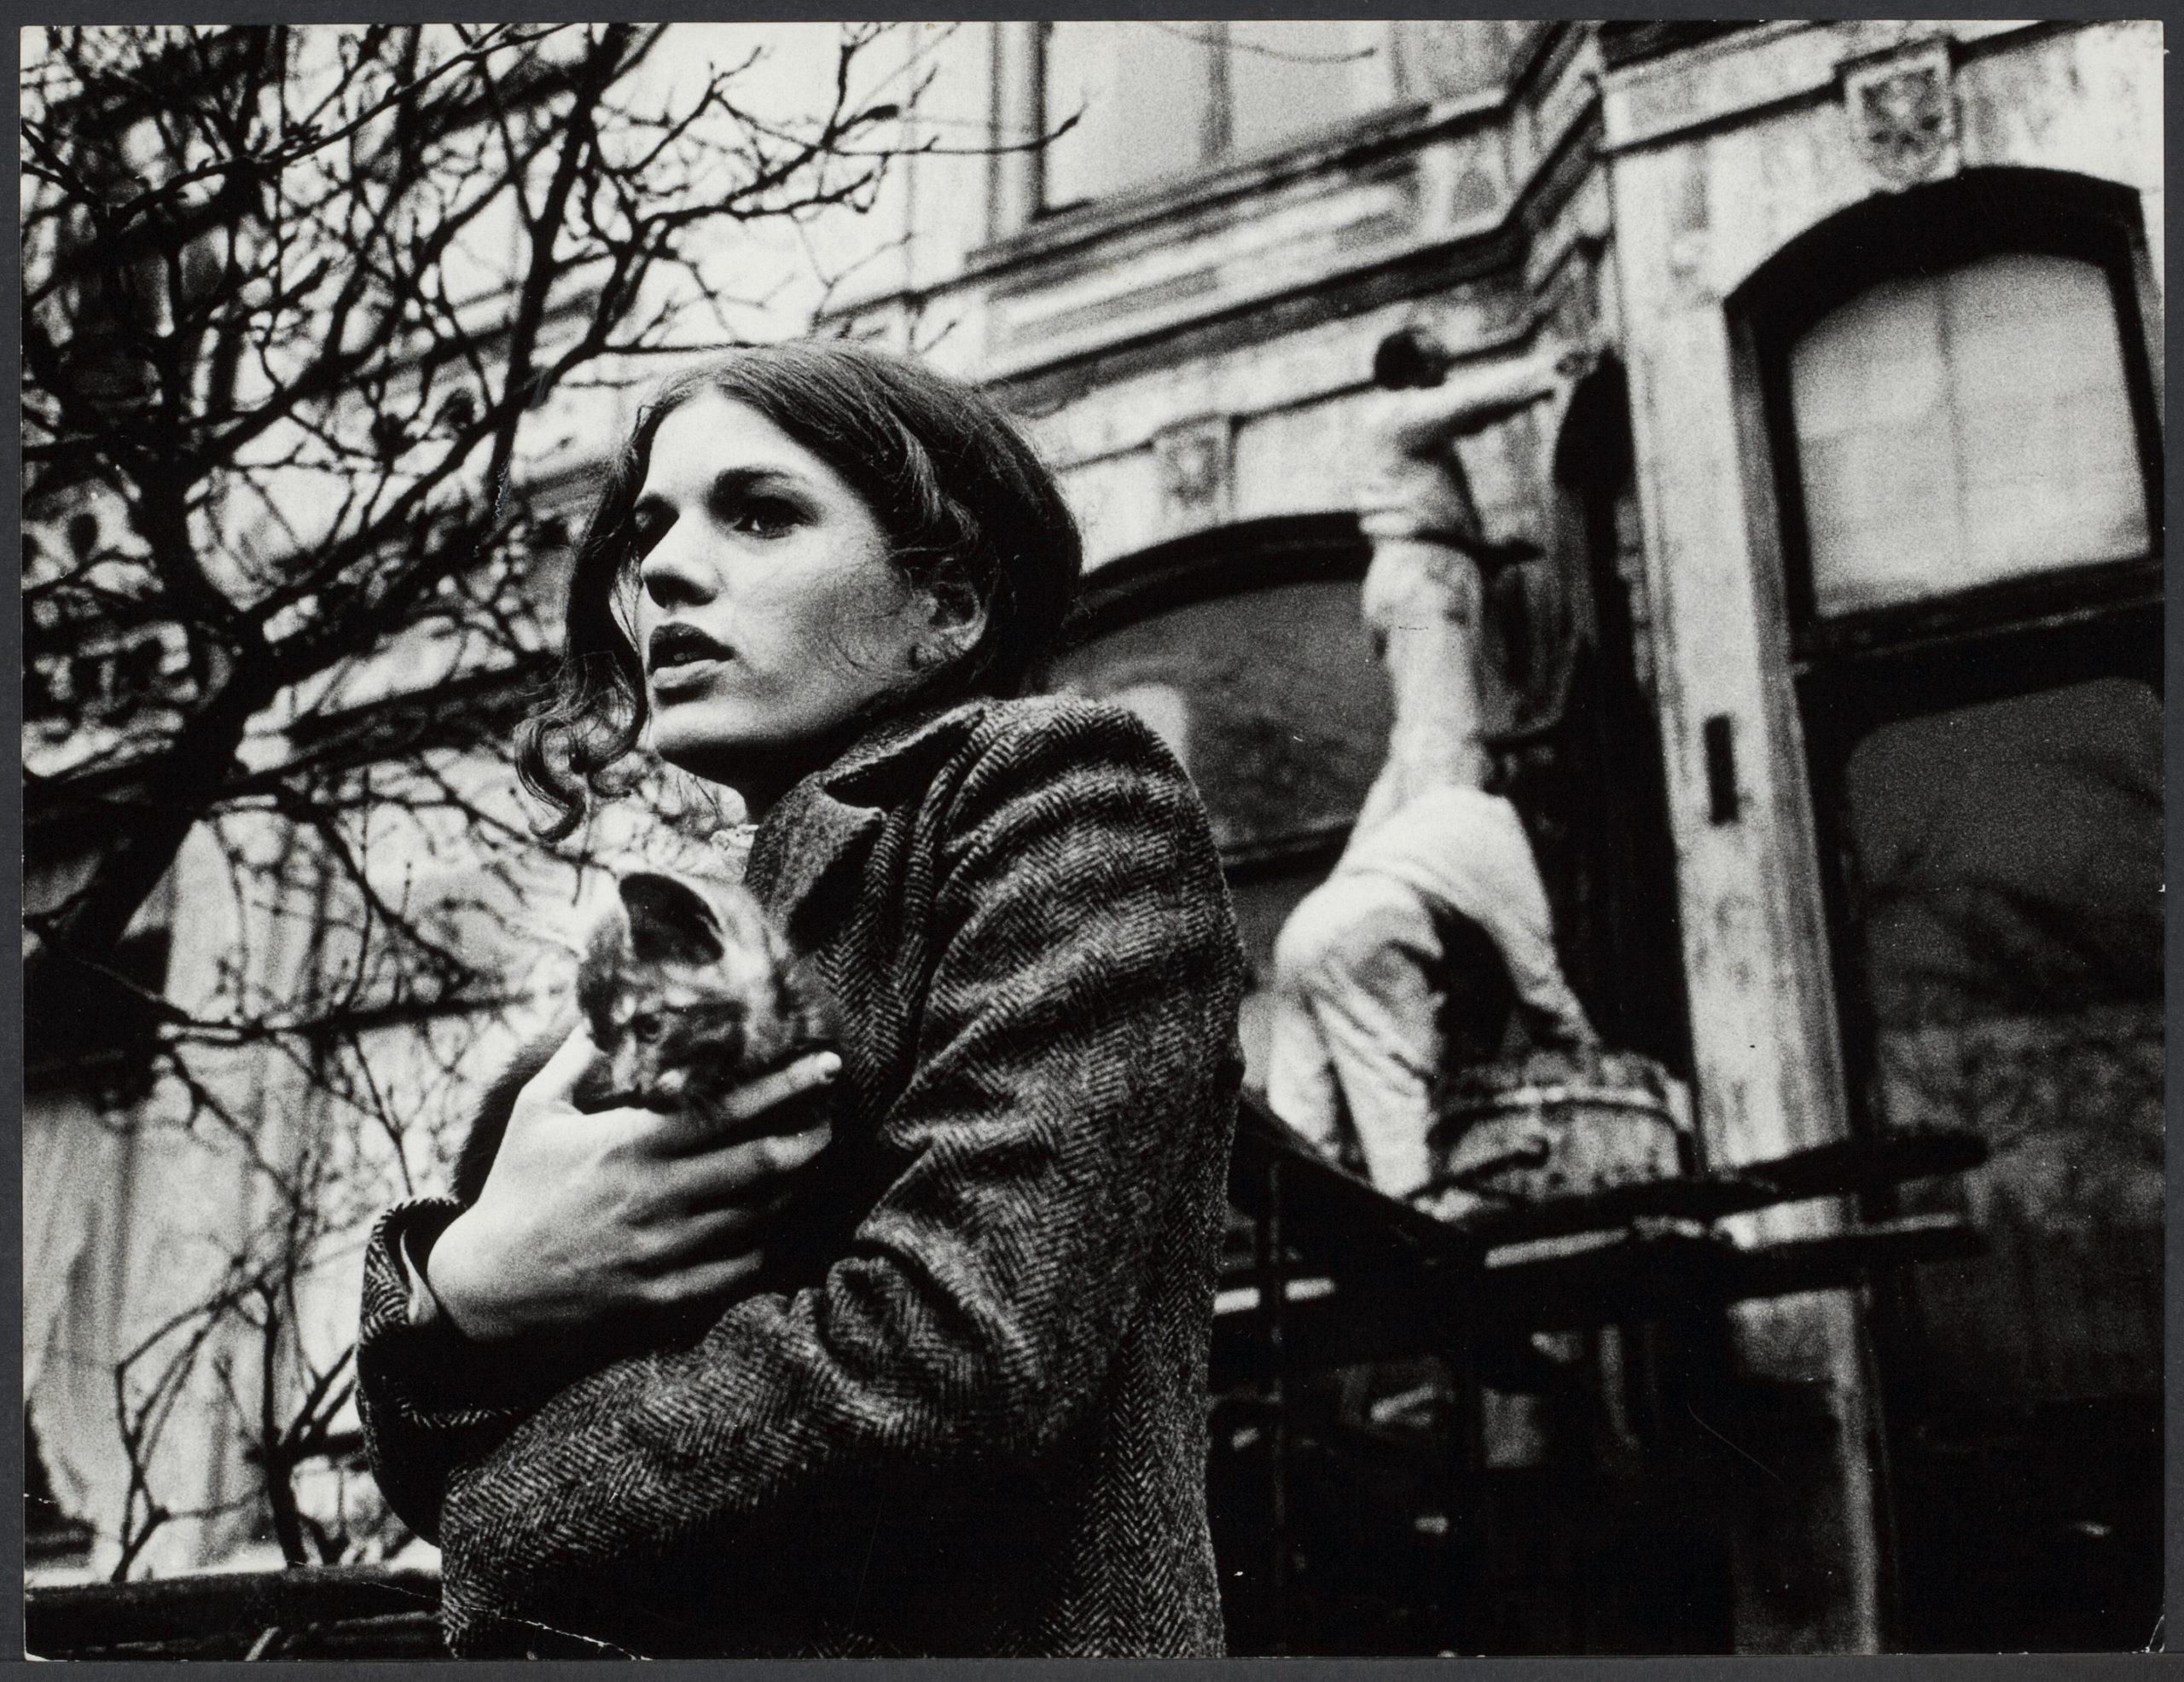 Actrice Pamela Koevoets in de film Paranoia